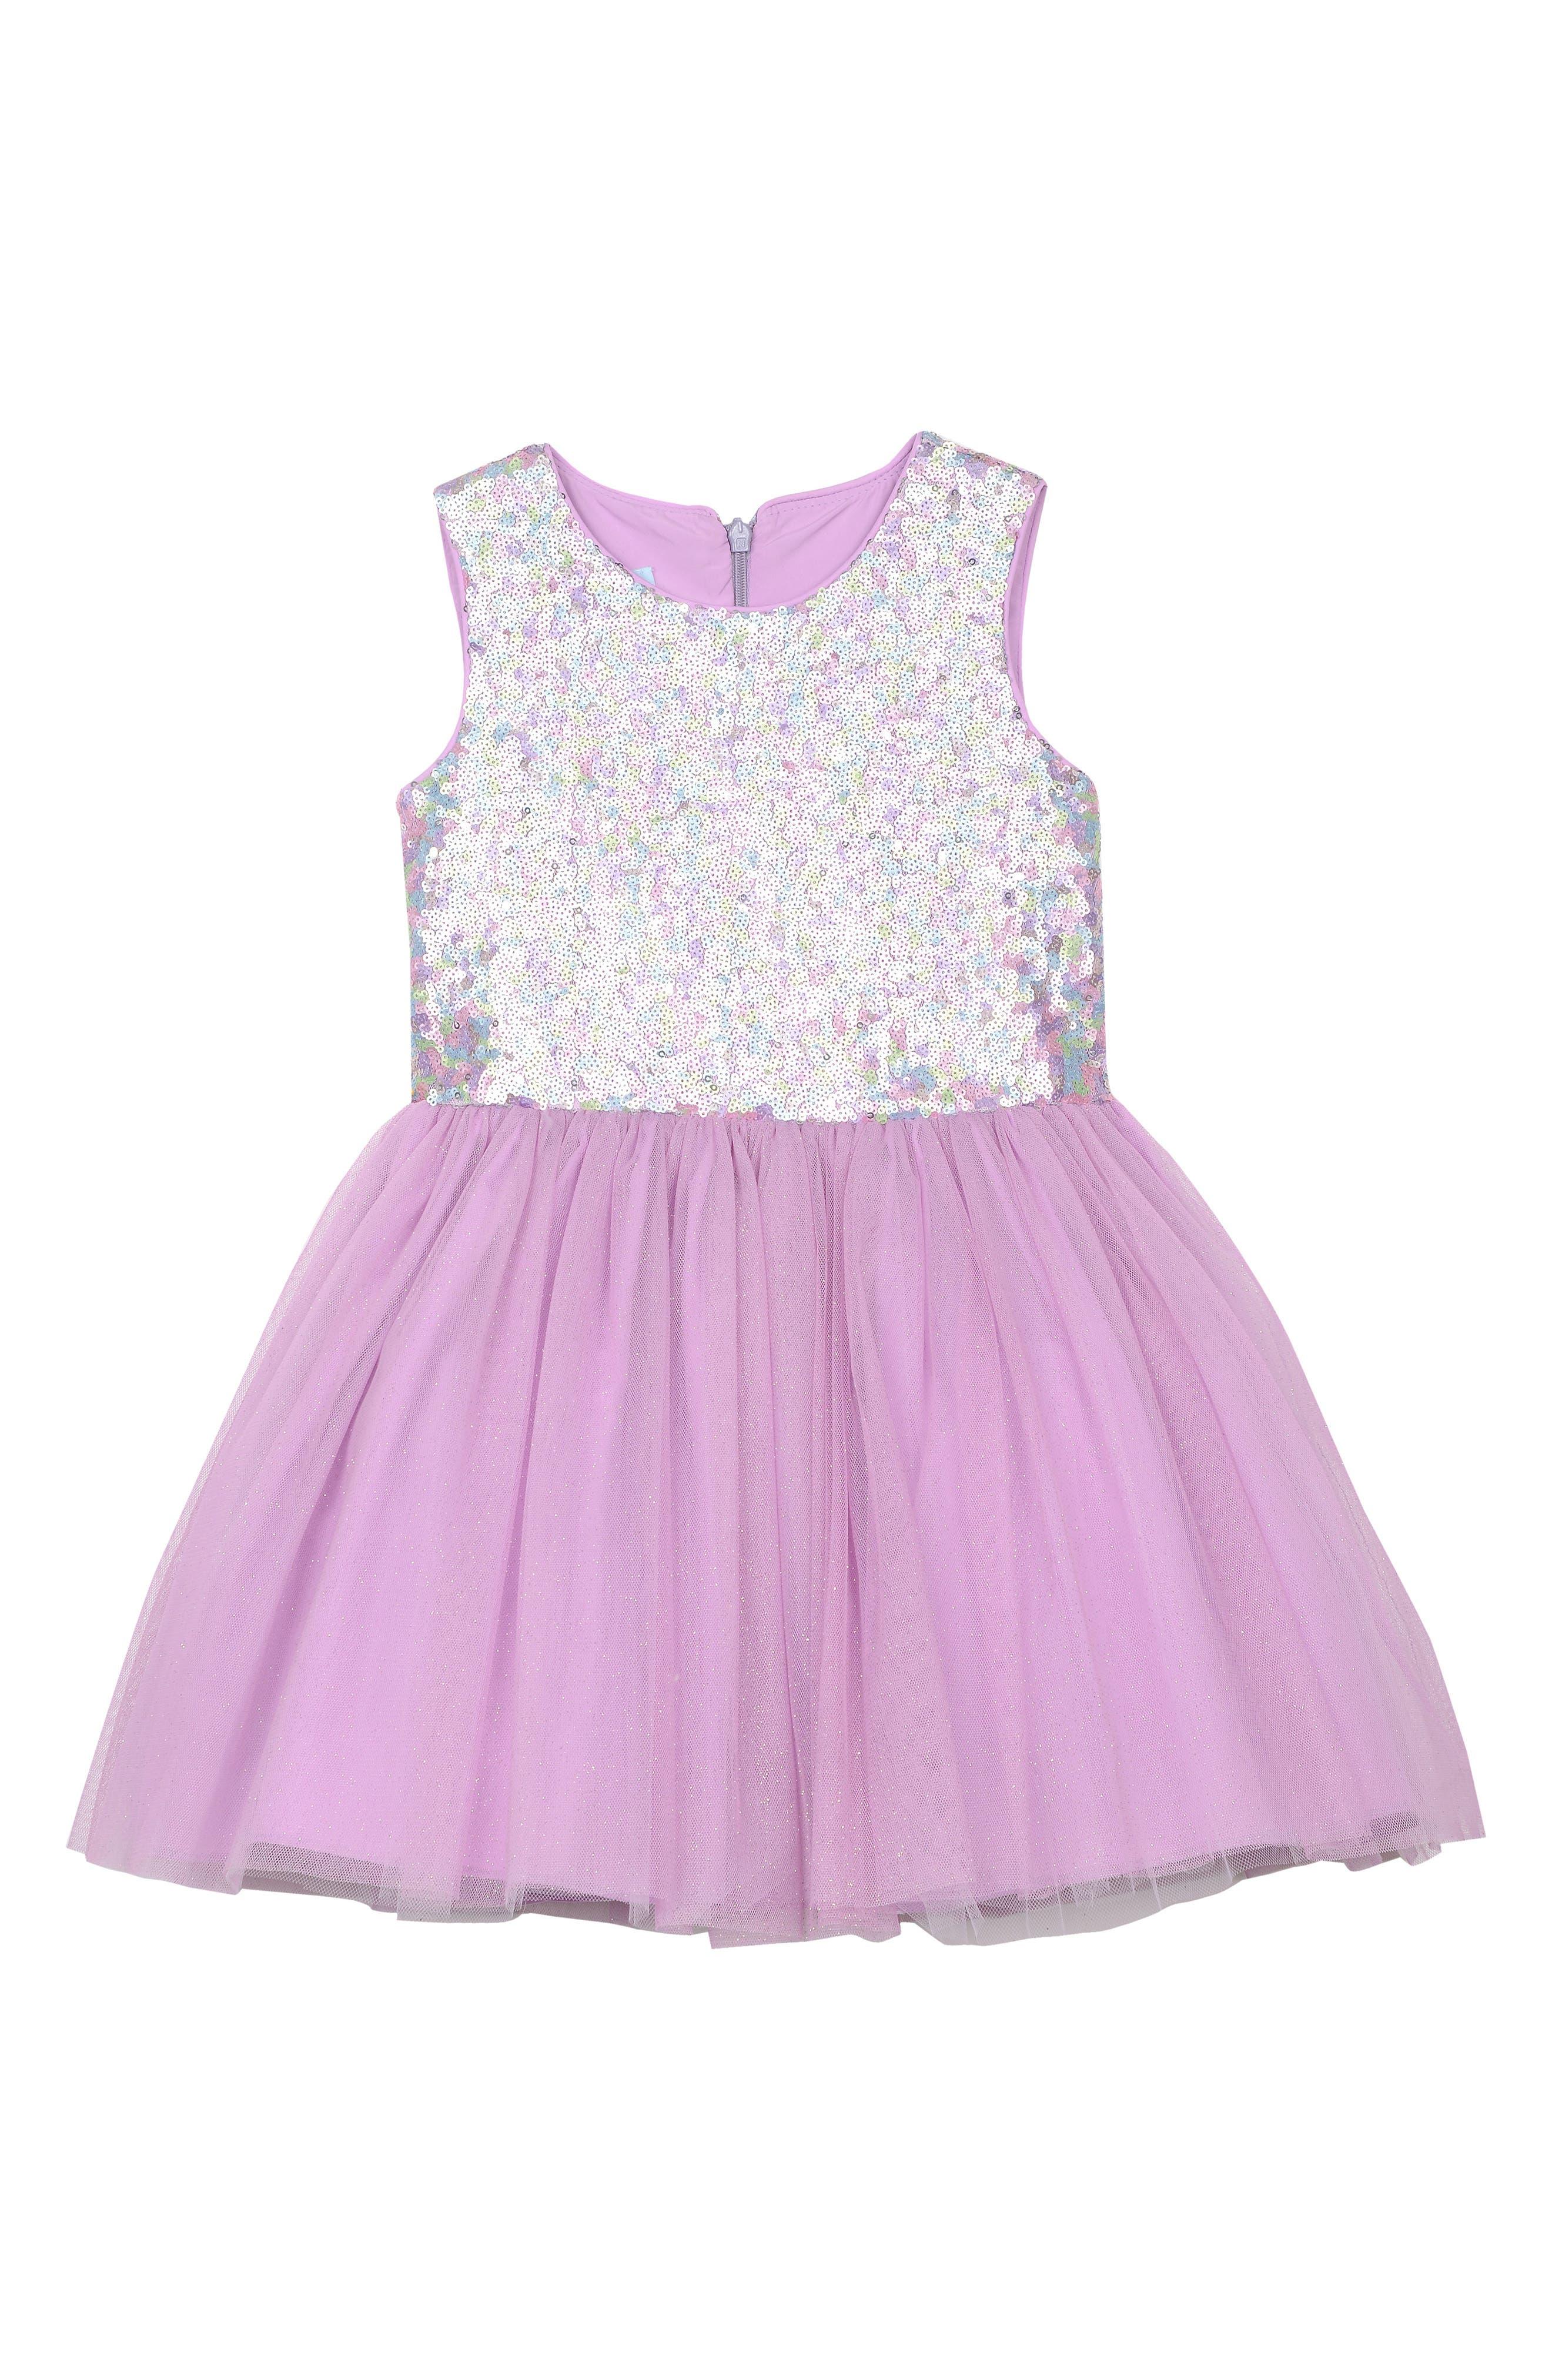 Pippa & Julie Sequin & Tulle Dress (Baby Girls)